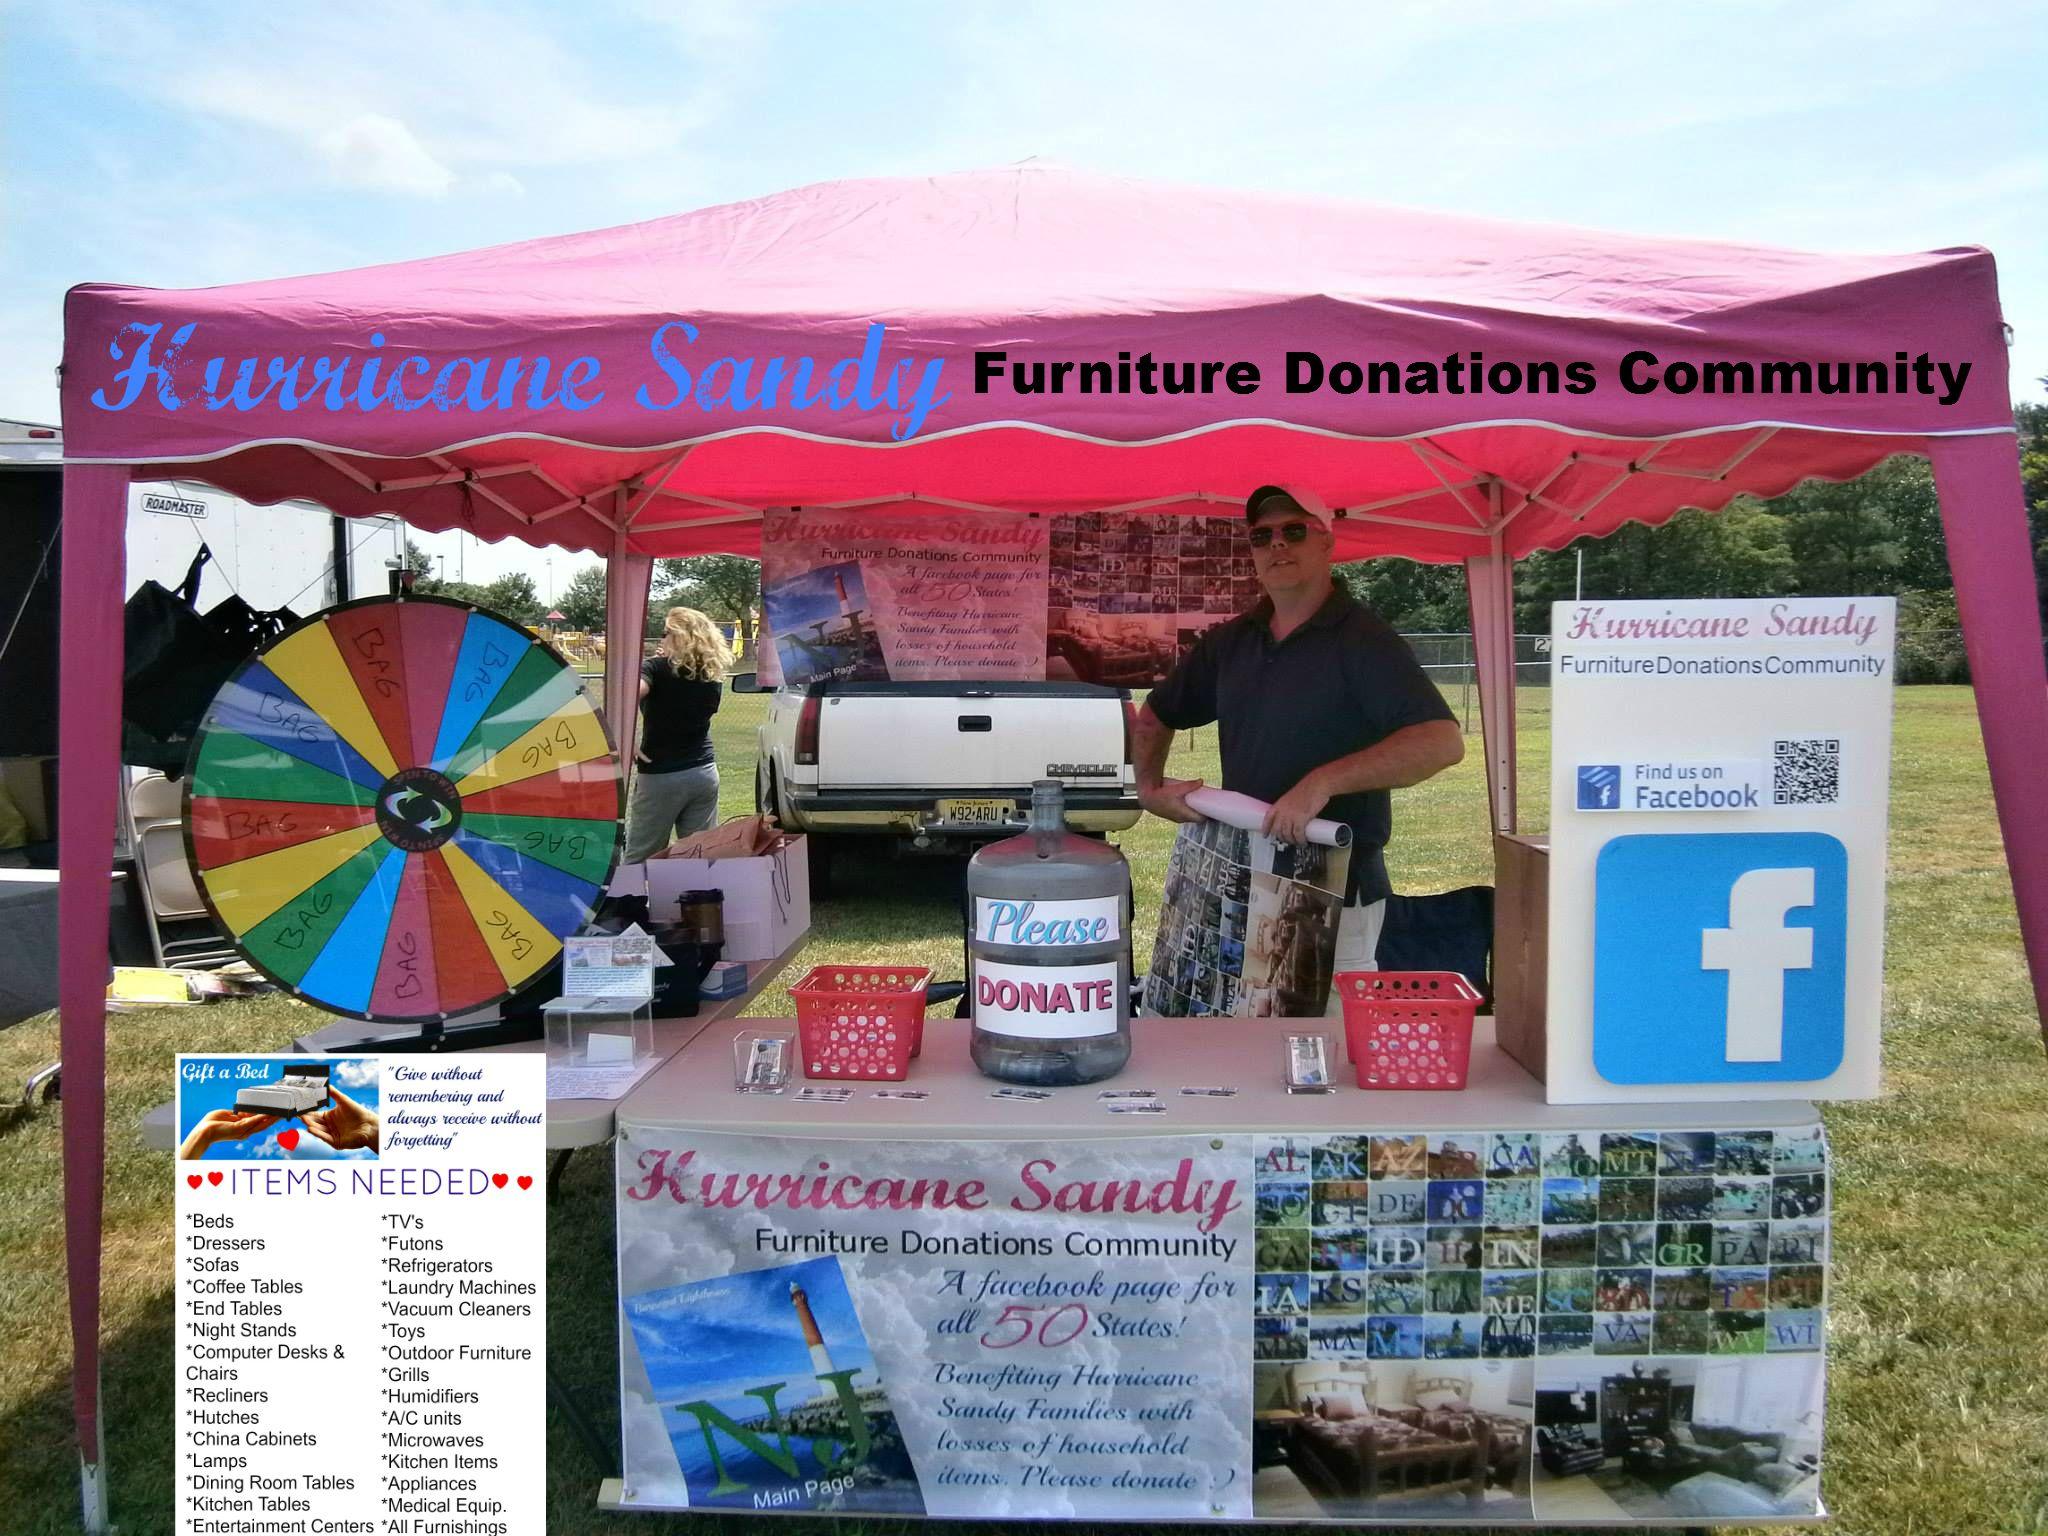 Soulsational Music Wellness Festival Bayville Nj Hurricane Sandy Furniture Donations Community Facebook Dresser With Tv Hurricane Sandy Donate Furniture